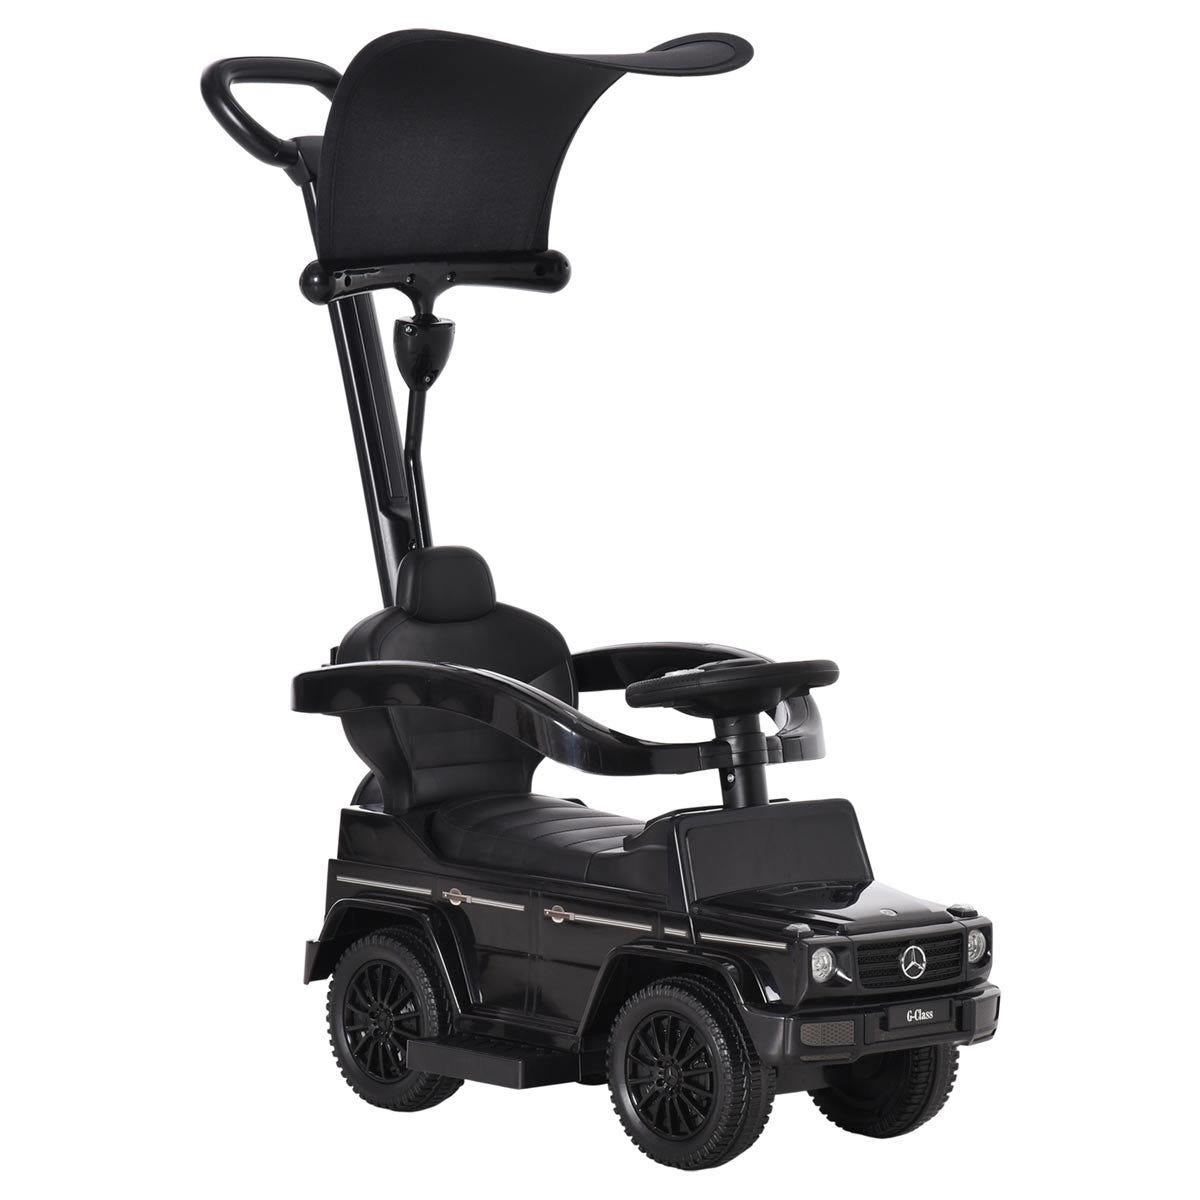 Reiten Kids Benz G350 Ride-on Sliding Car & Stroller - Black